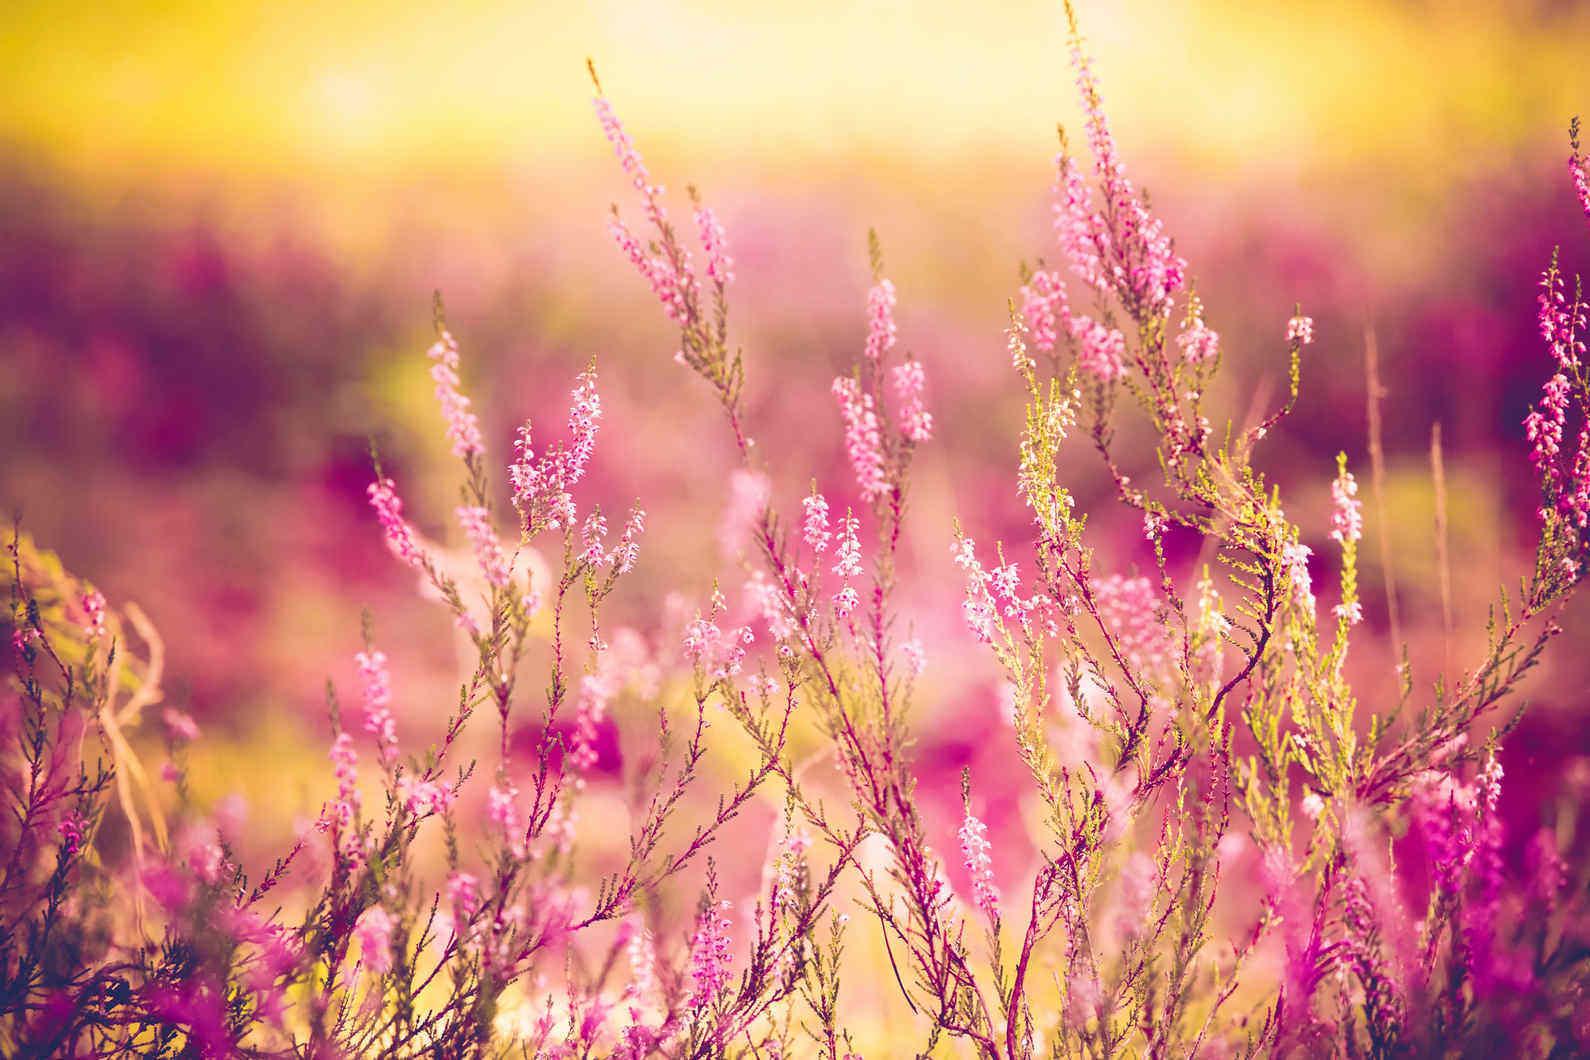 close up of purple heather wildflowers